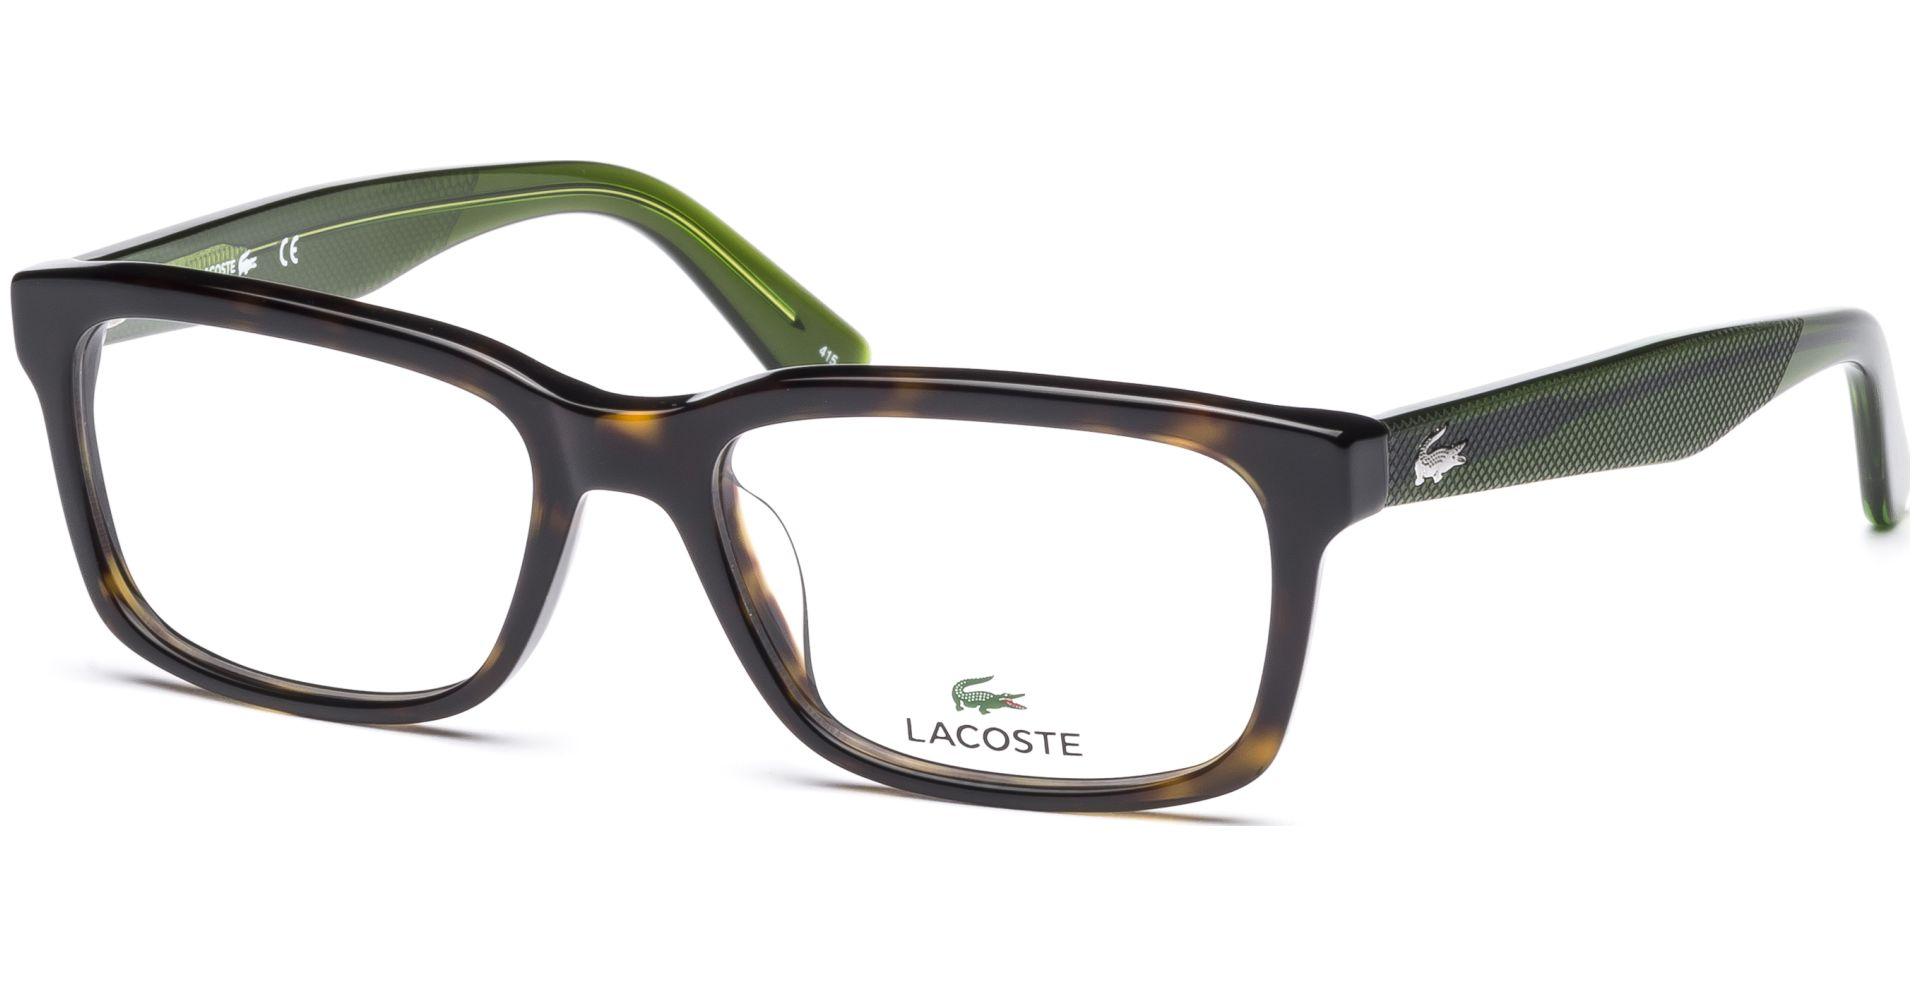 Lacoste - L2672 214 5217 Havana - von Lensbest